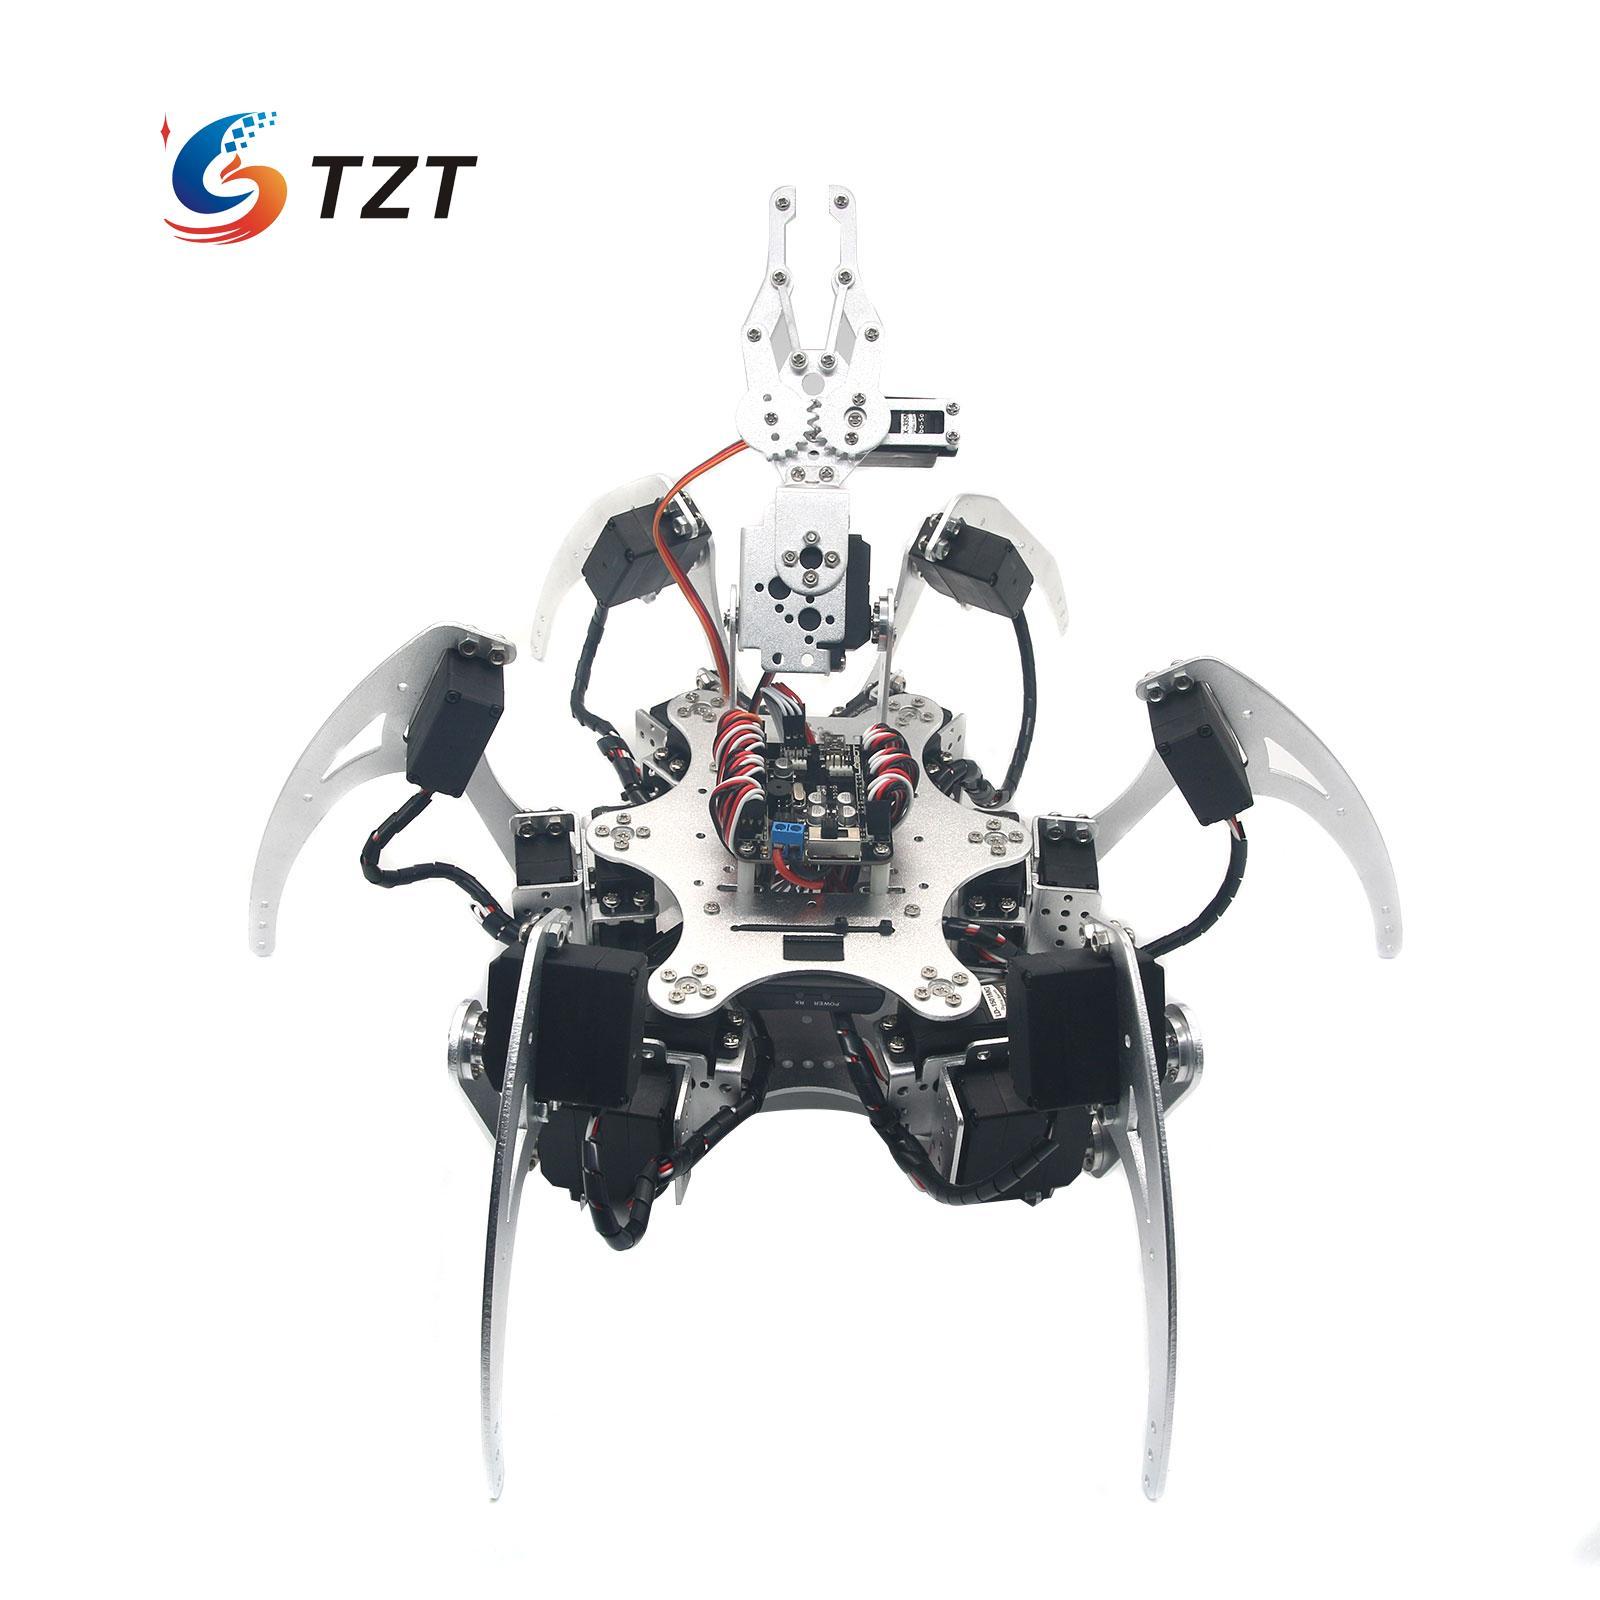 20DOF Aluminium Hexapod Robotic Spider Six Legs Robot Frame Kit Compatible with Arduino Silver 18dof aluminium hexapod spider six legs robot kit w 18pcs mg996r servo